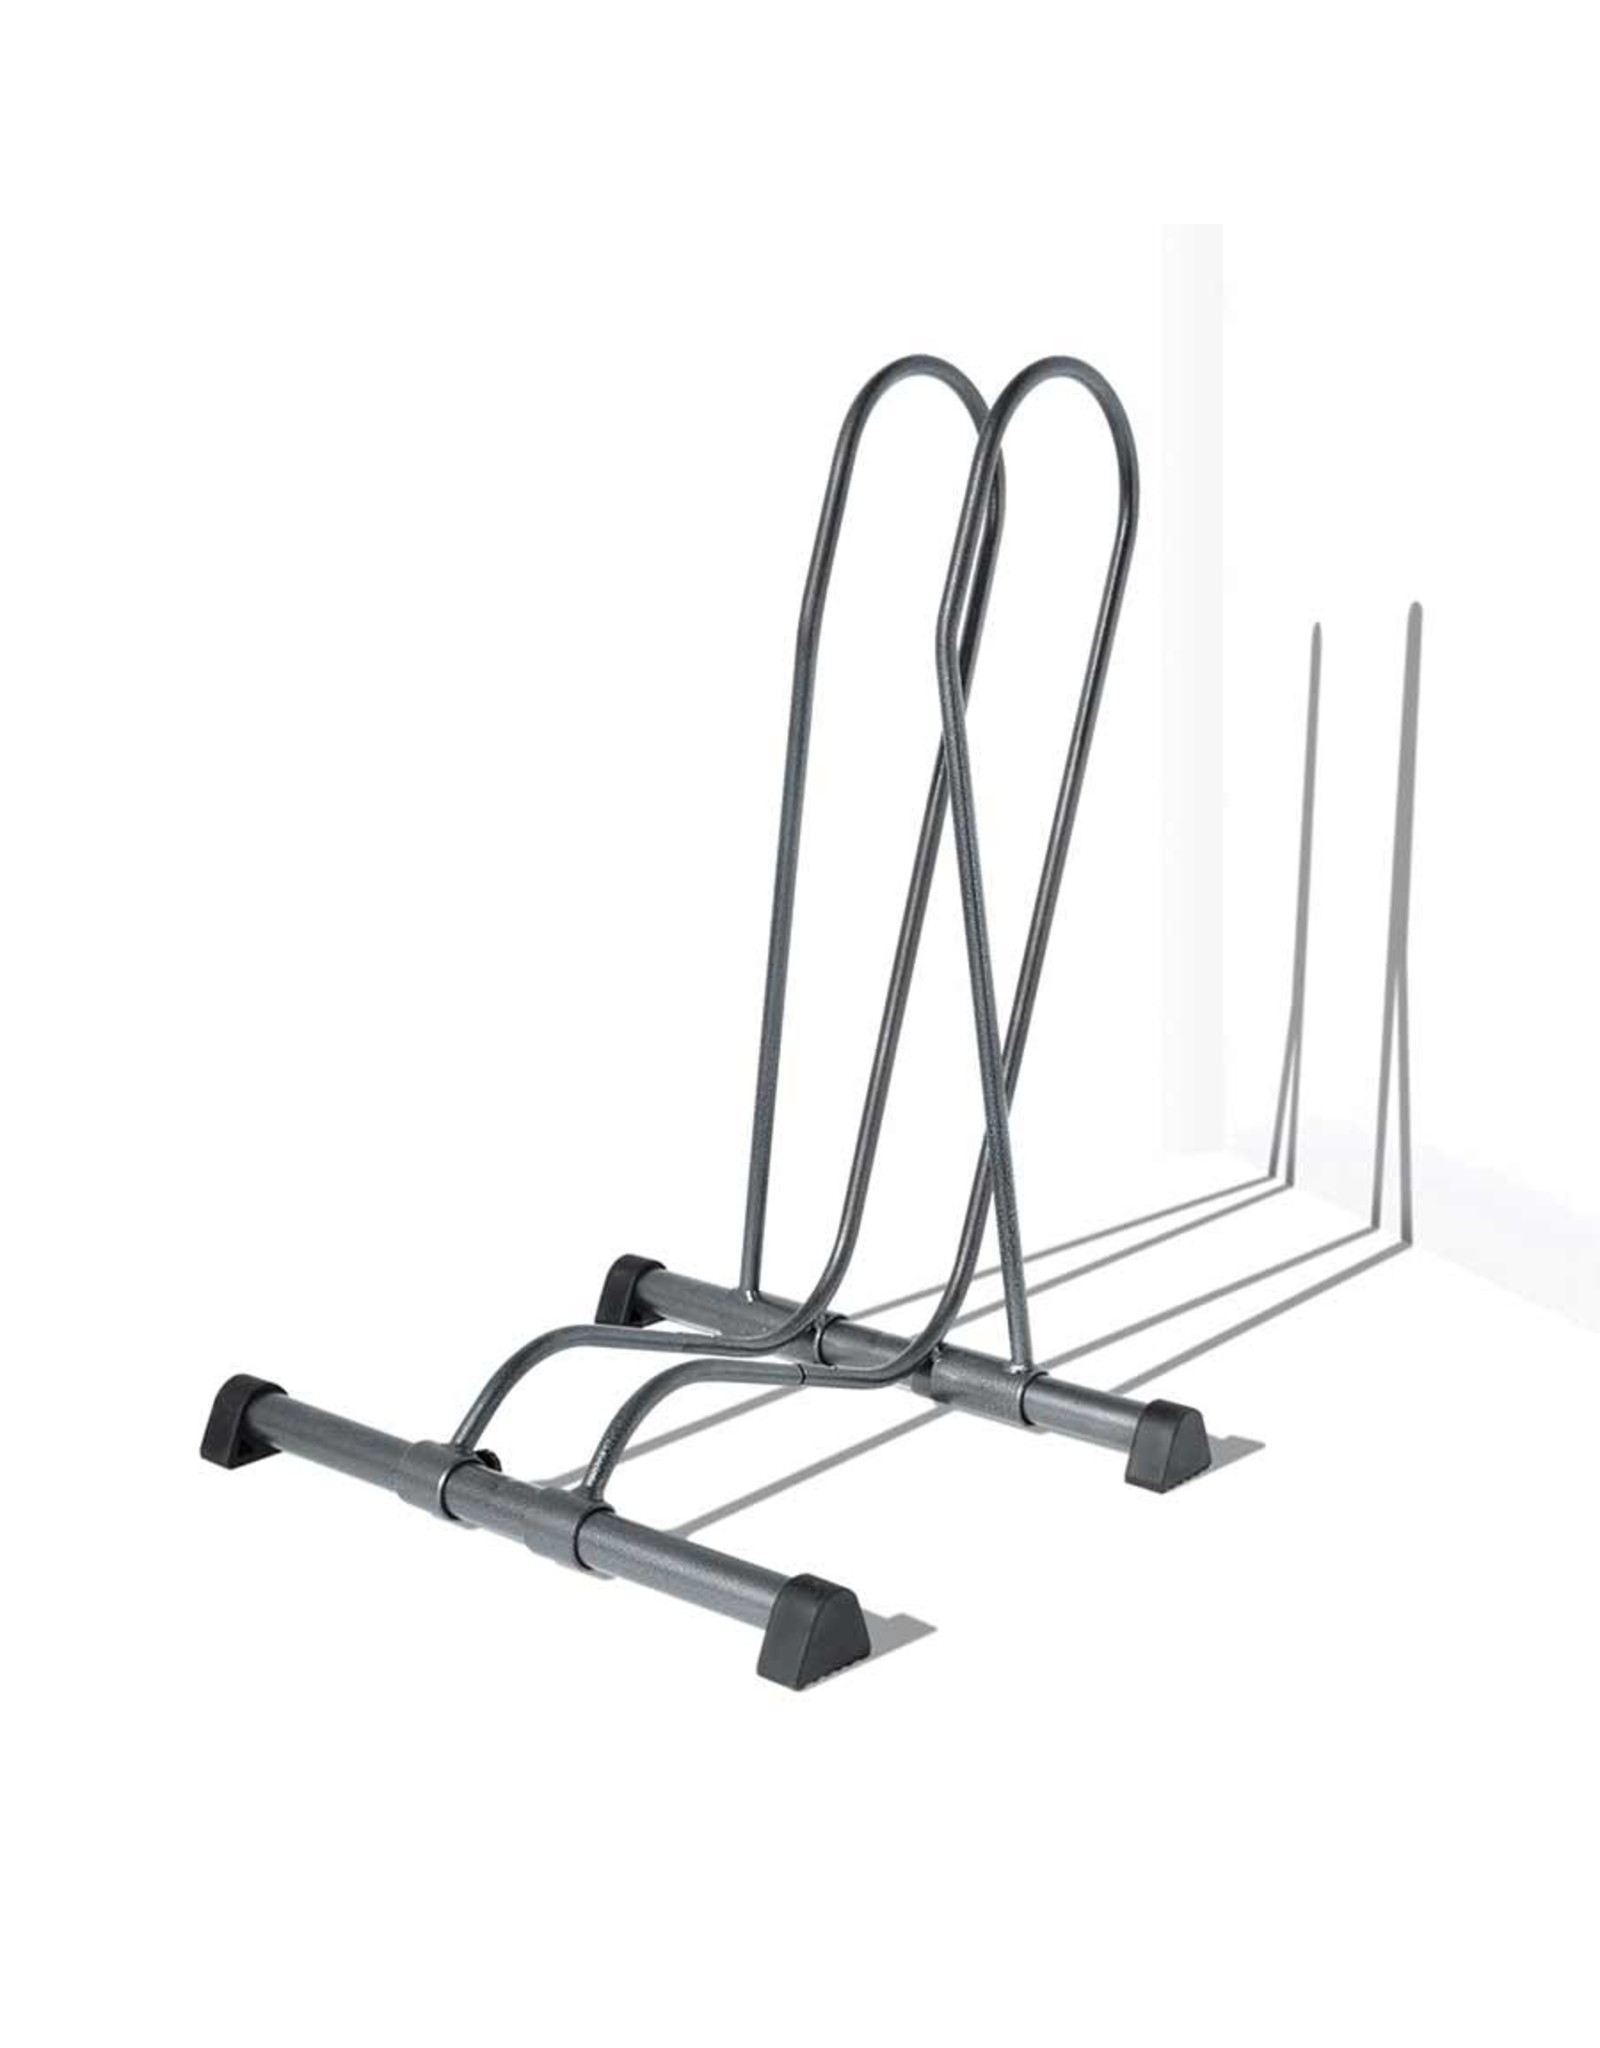 Evo The shop rack Delta adjustable